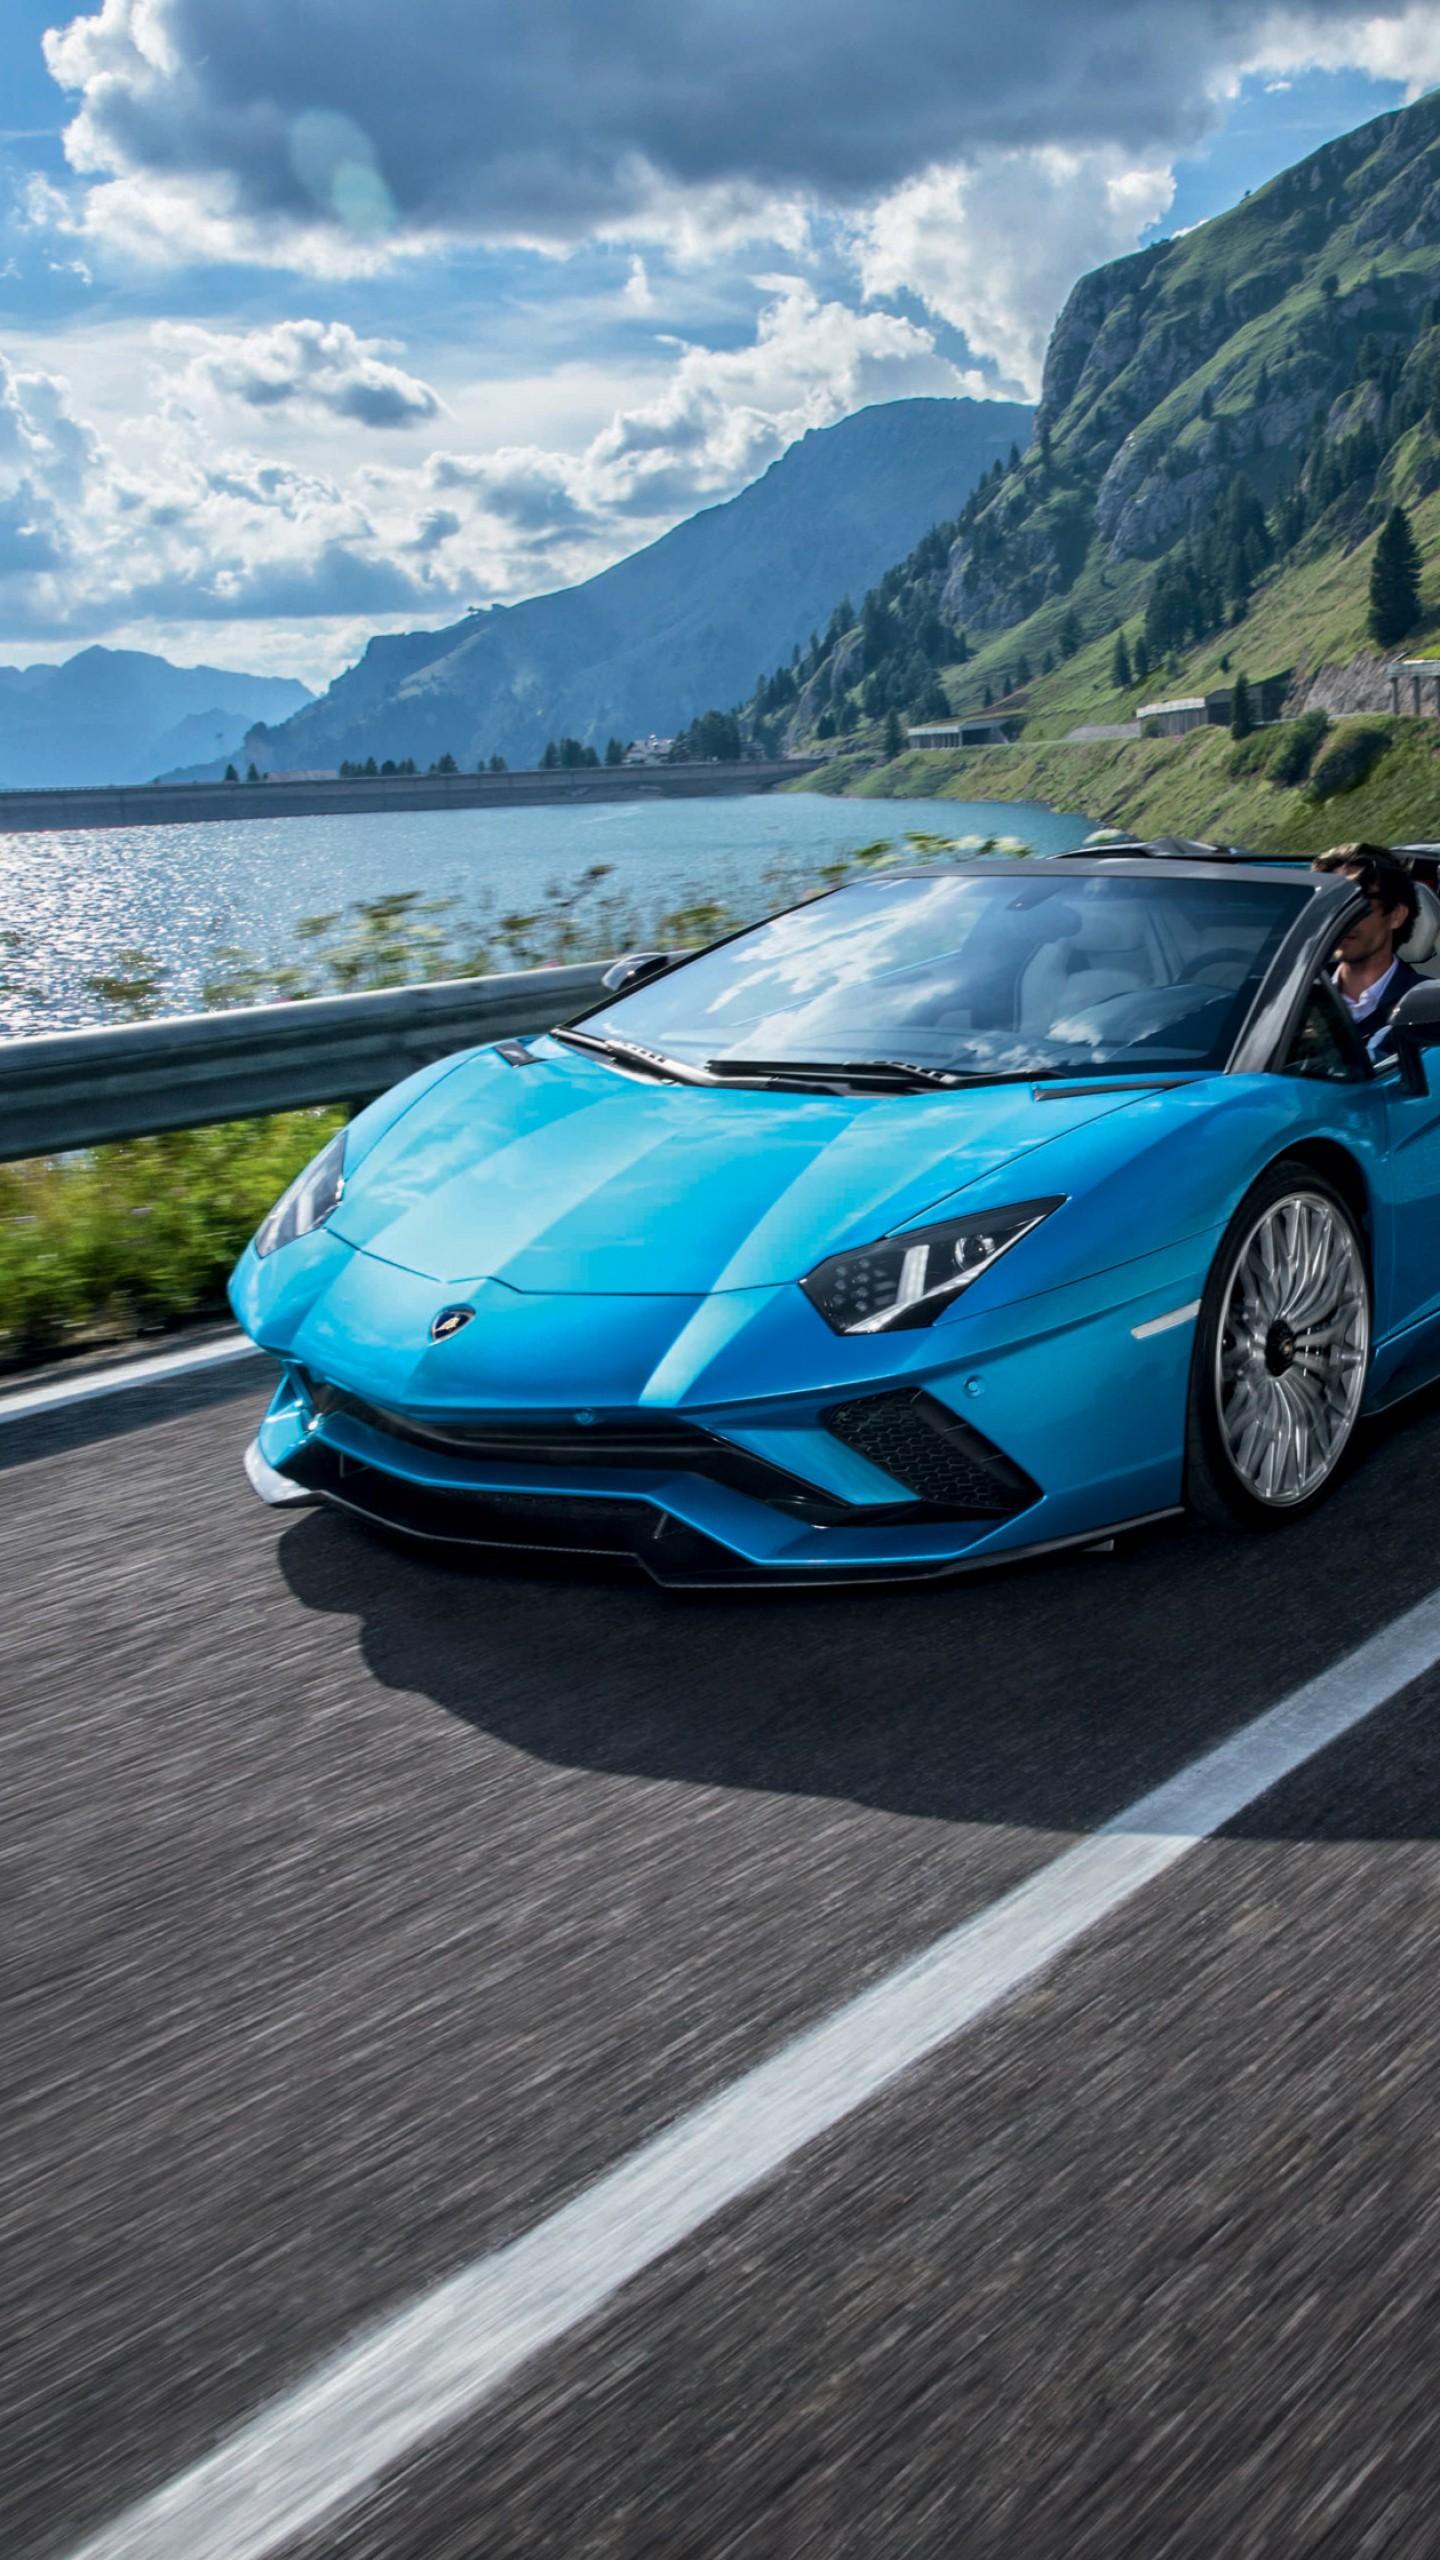 обои авентадор родстер Lamborghini Aventador S Roadster